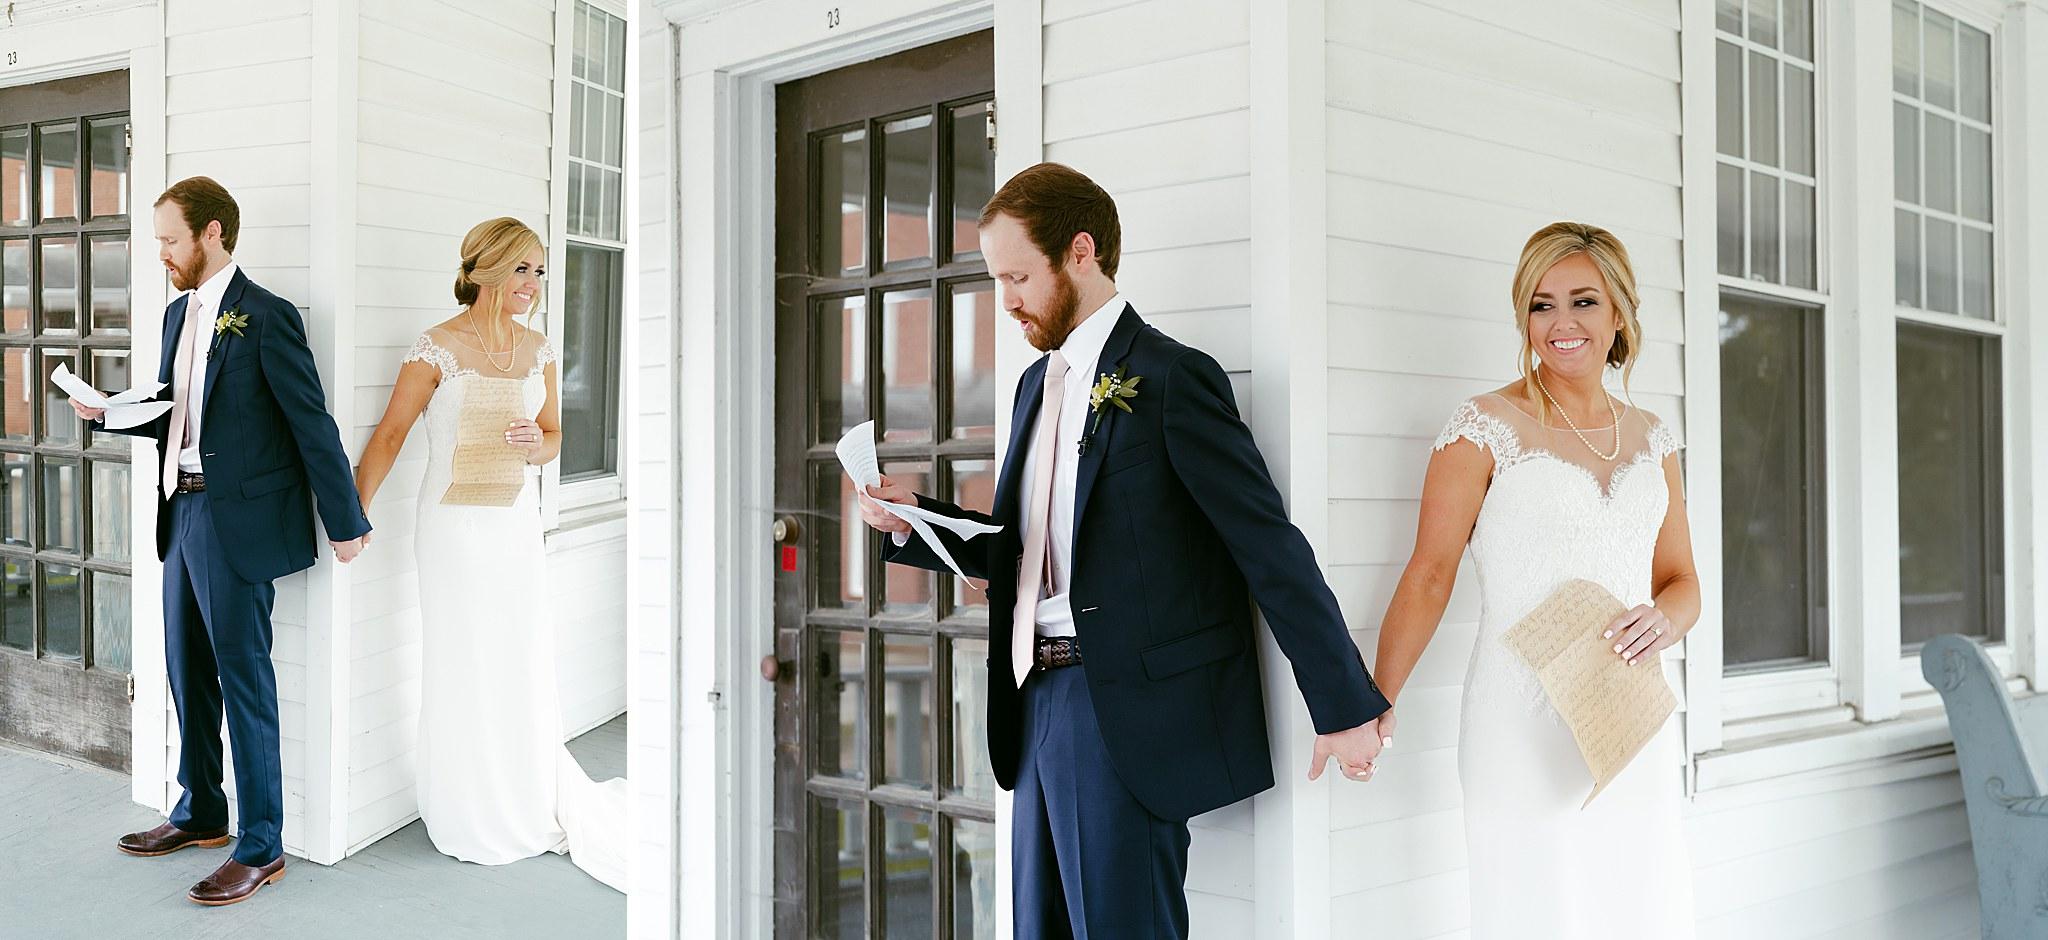 Williamston-NC-Wedding-Photographer 0017.jpg